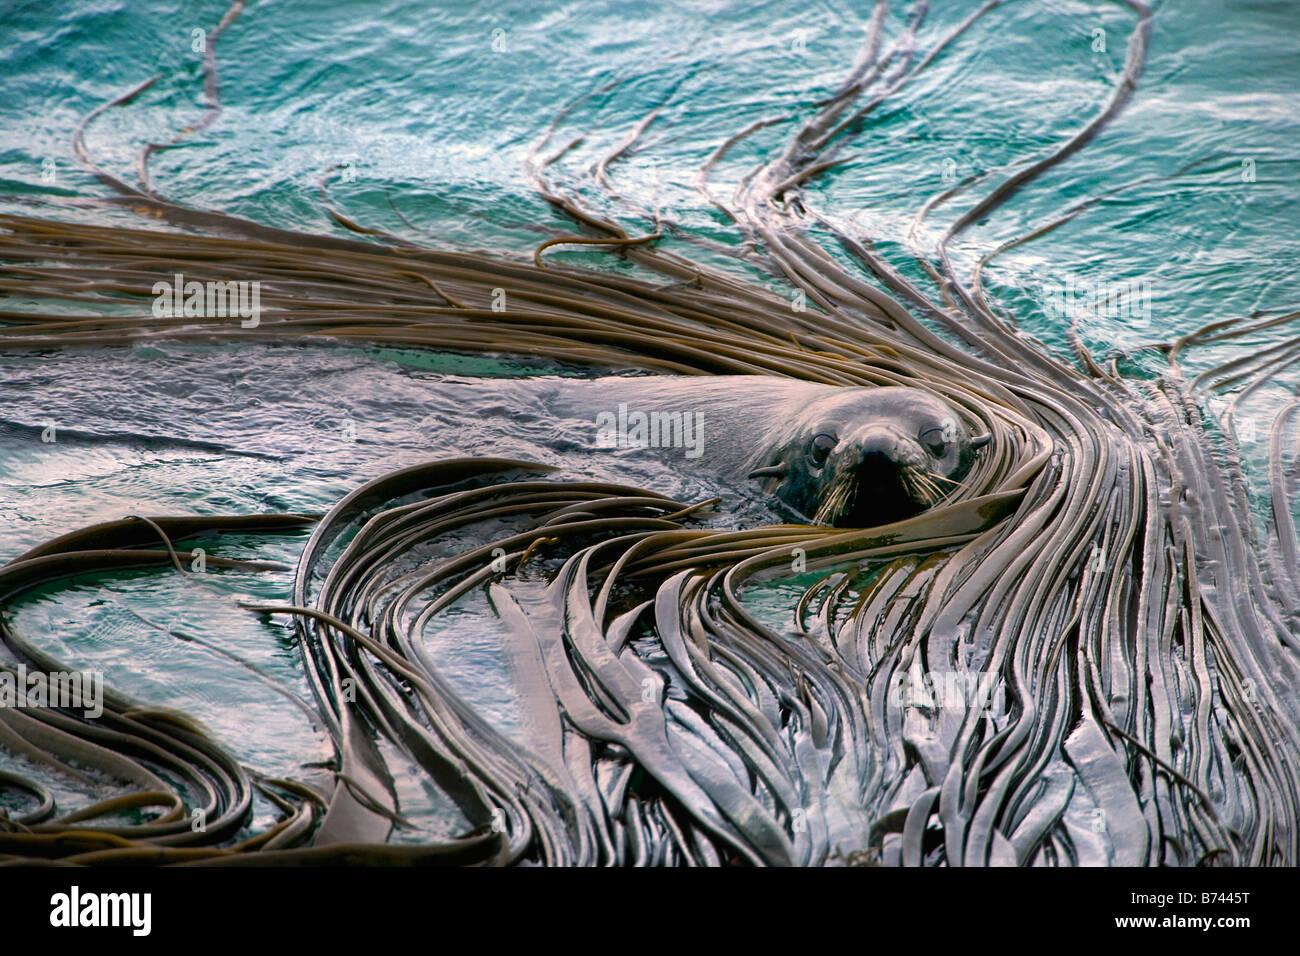 New Zealand, South Island, Dunedin, Otago Peninsula, Australasian Fur Seal (Arctocephalus fosteri). - Stock Image